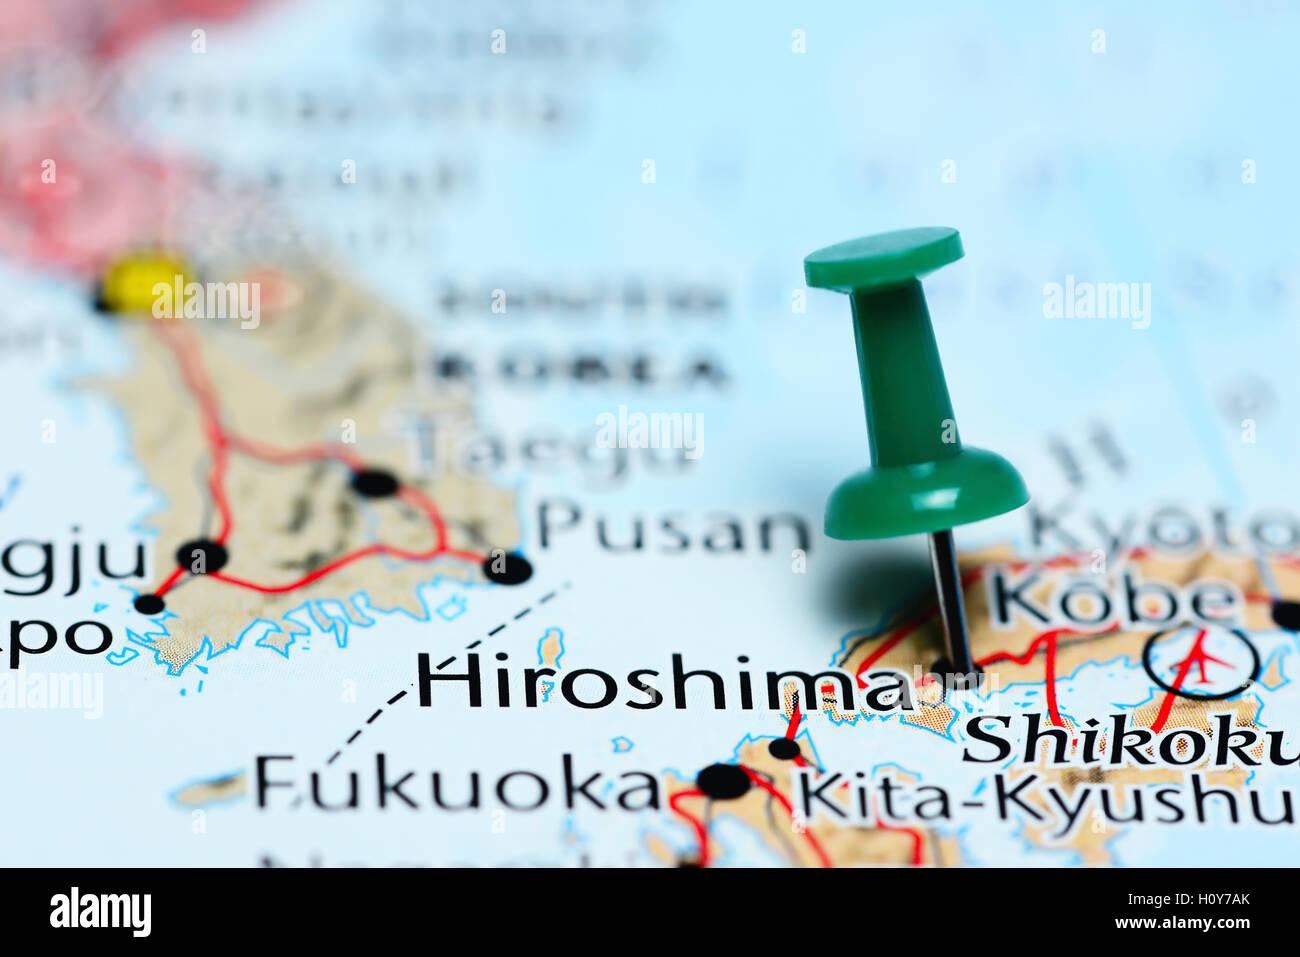 Hiroshima Map Of Japan.Hiroshima Pinned On A Map Of Japan Stock Photo 121071067 Alamy